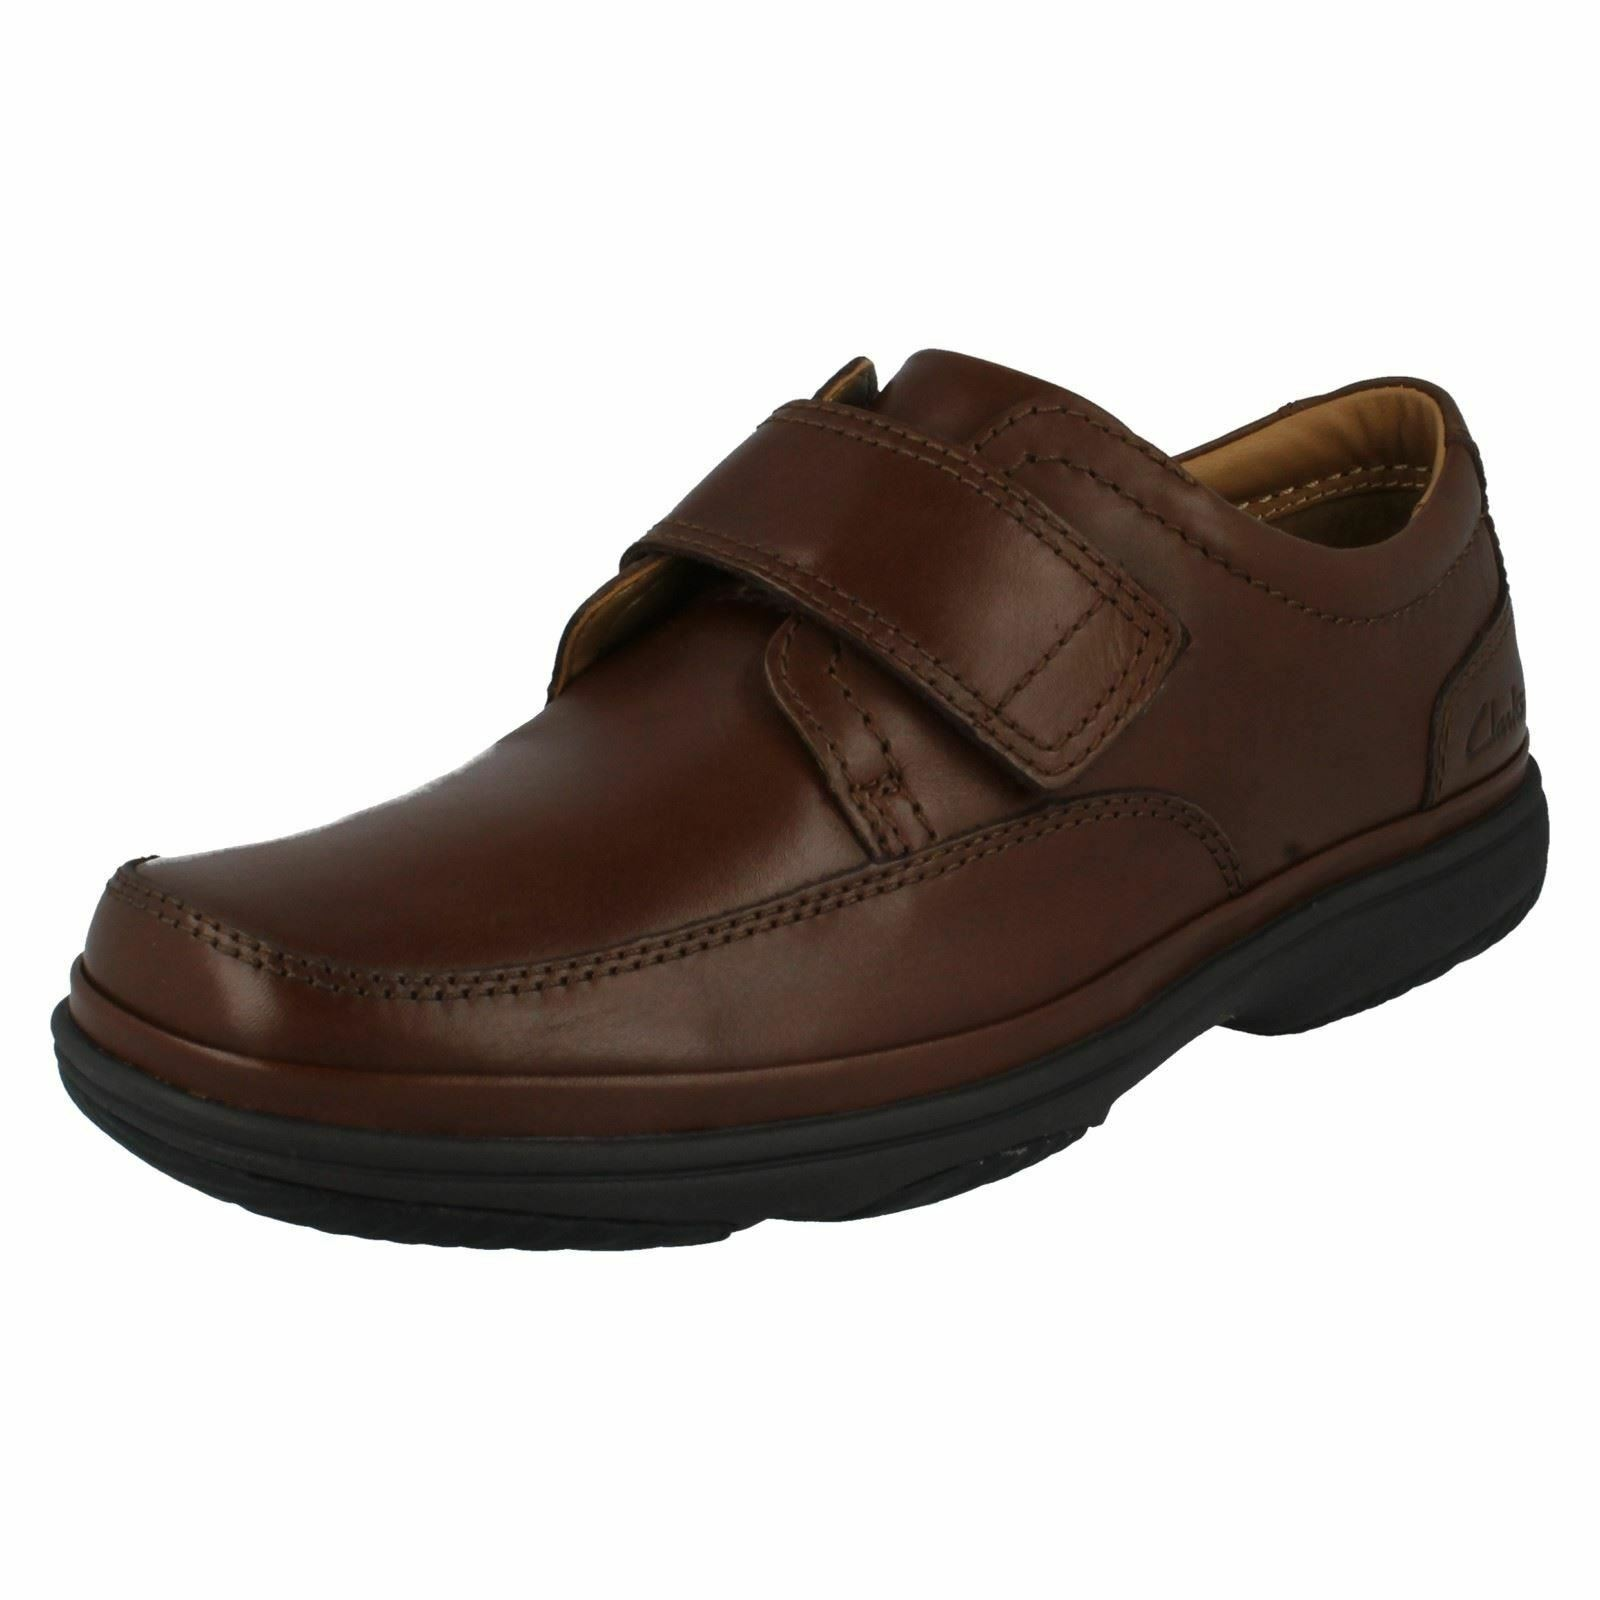 Clarks Hombre ' Zapatos de piel marrón ' Hombre Turn Swift ' 6ec53a